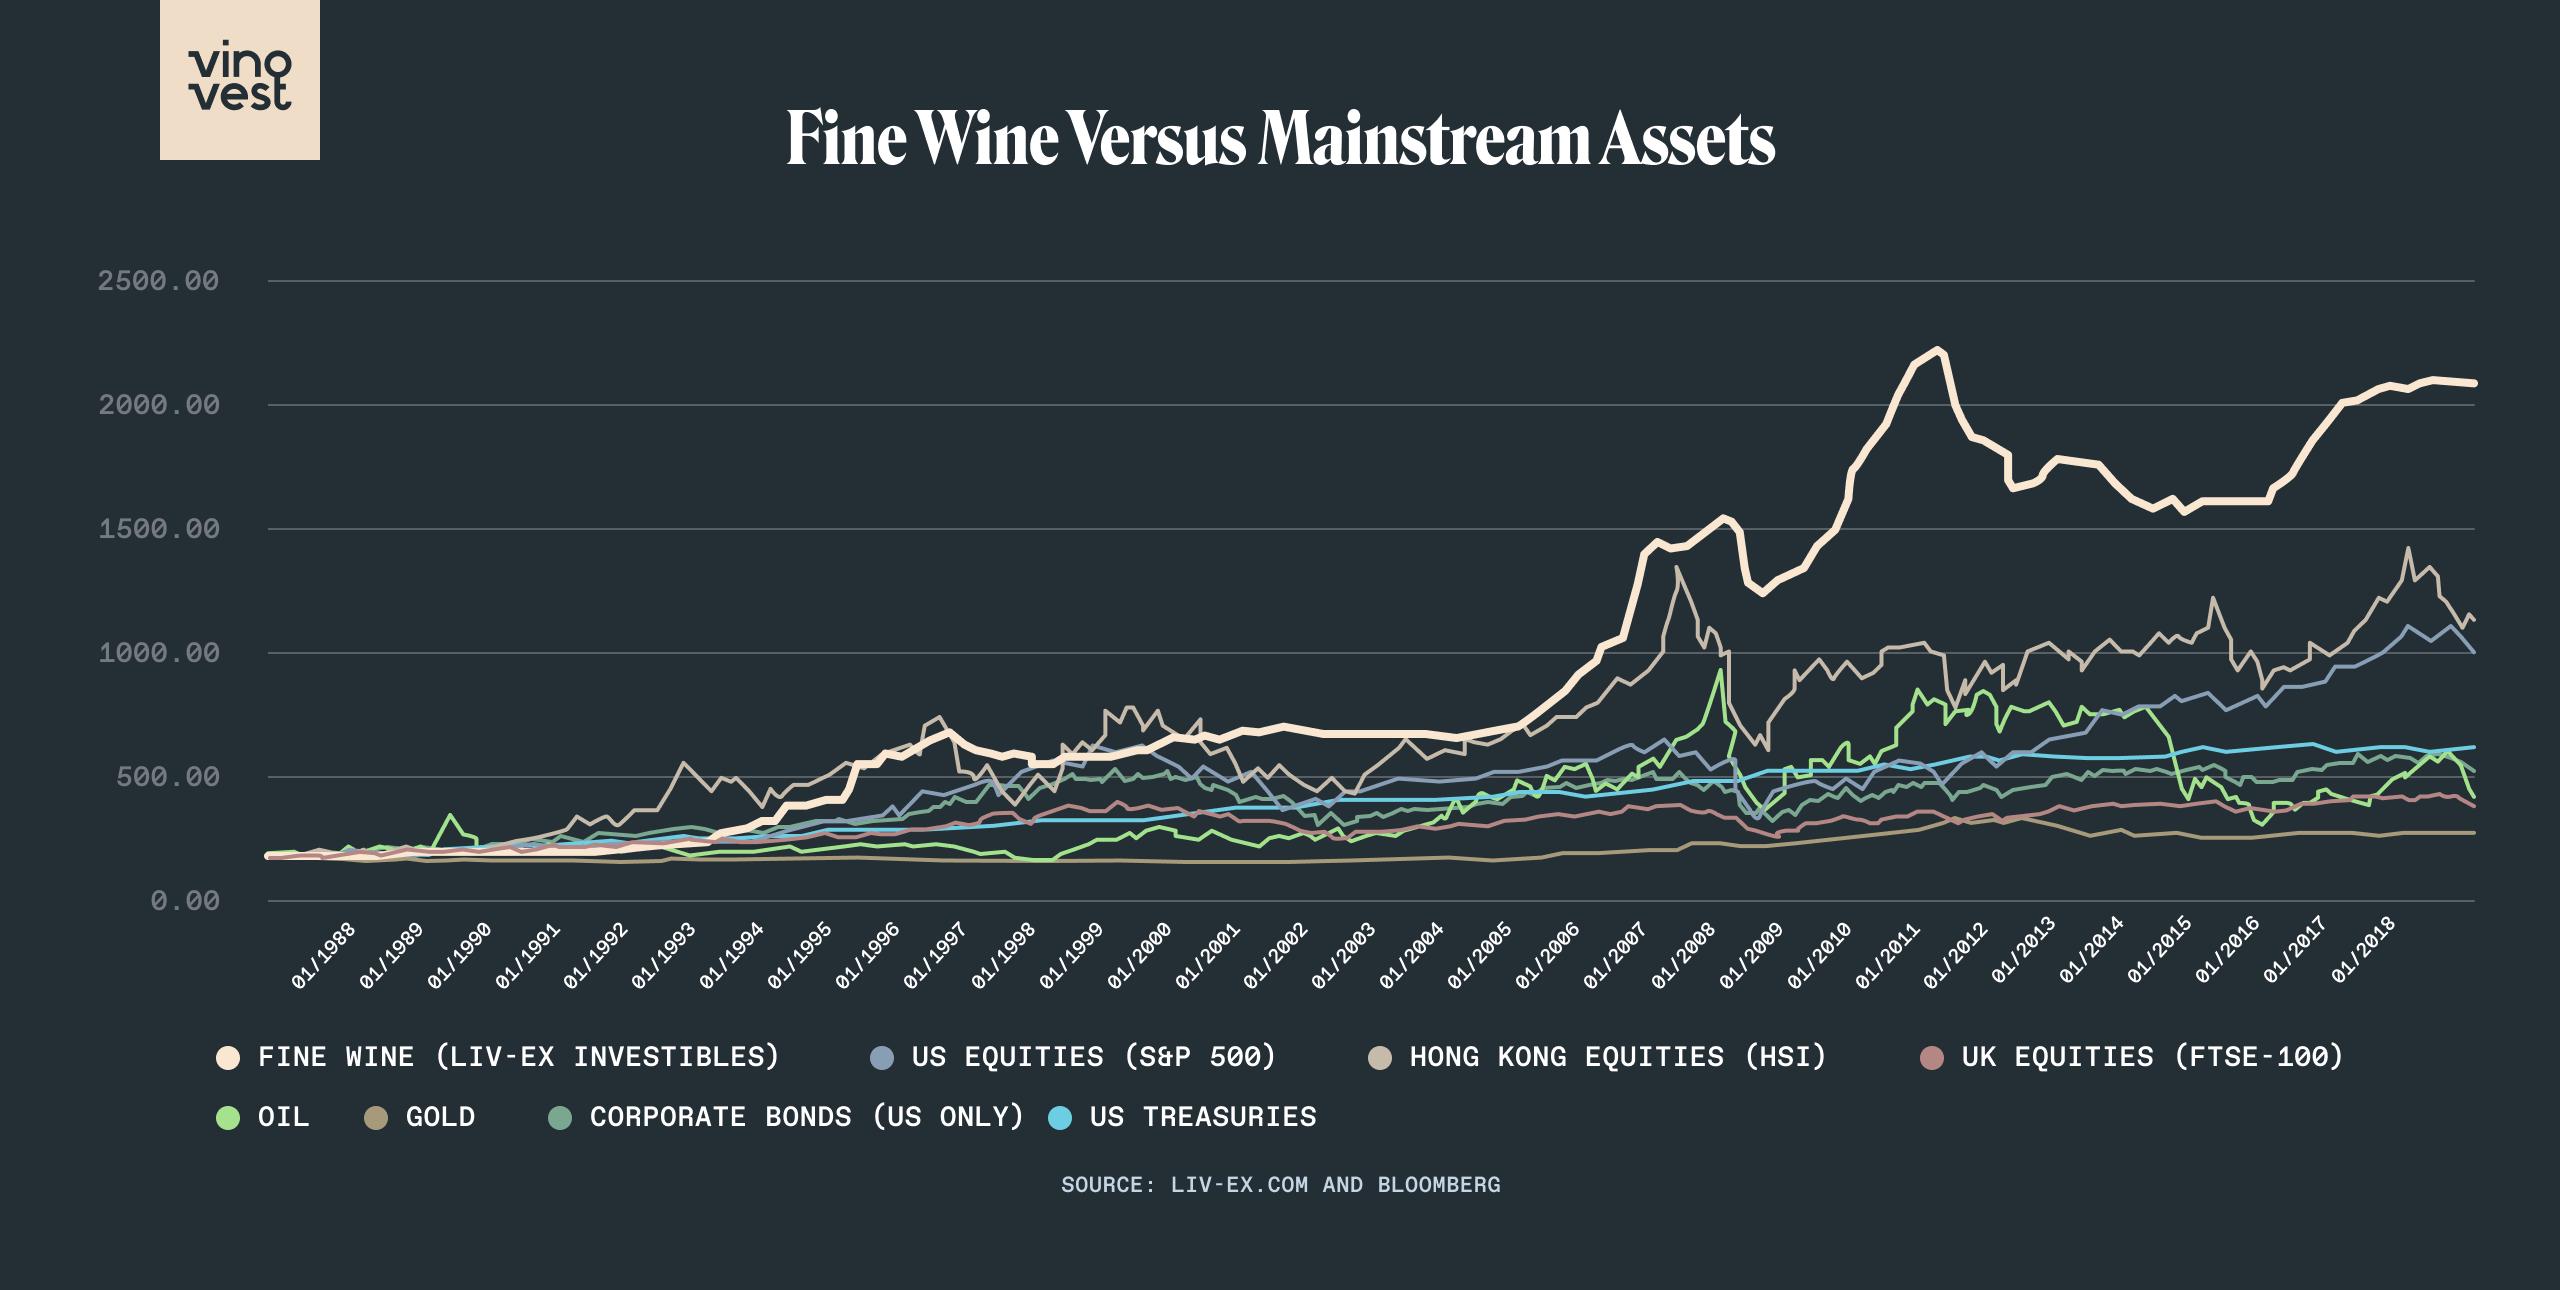 Fine Wine Versus Mainstream Assets